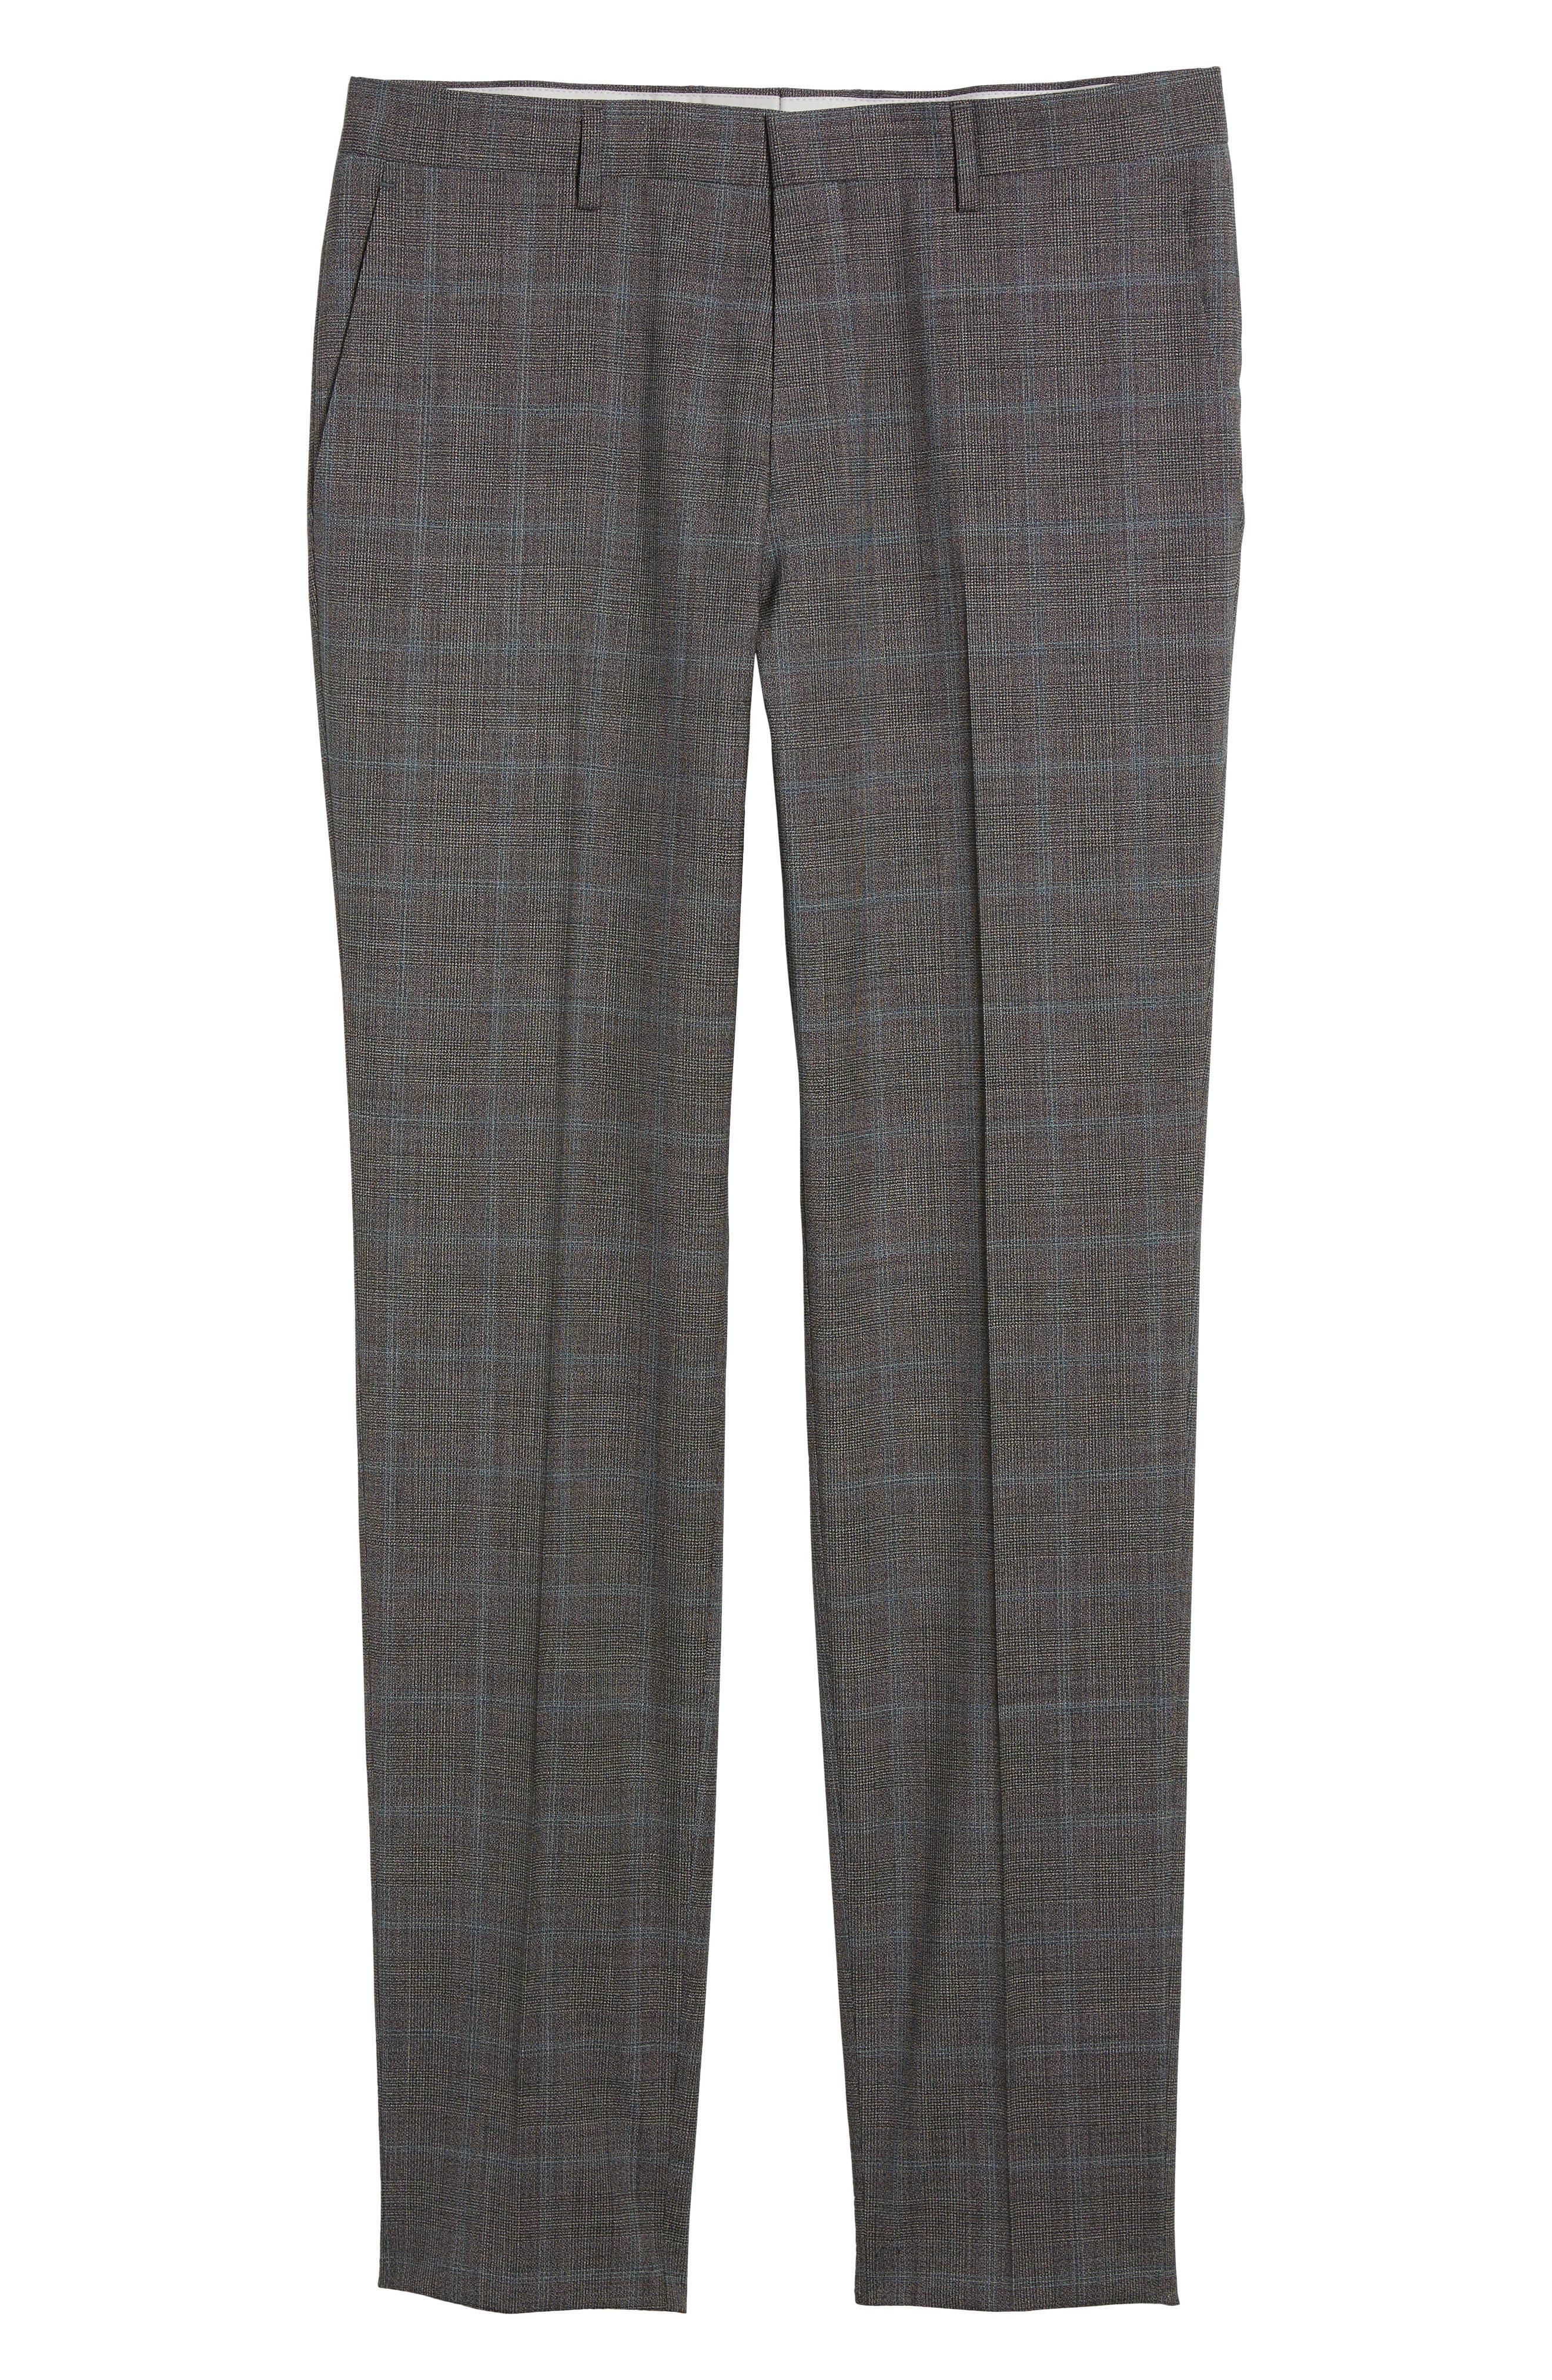 Genesis Flat Front Plaid Wool Trousers,                             Alternate thumbnail 6, color,                             061